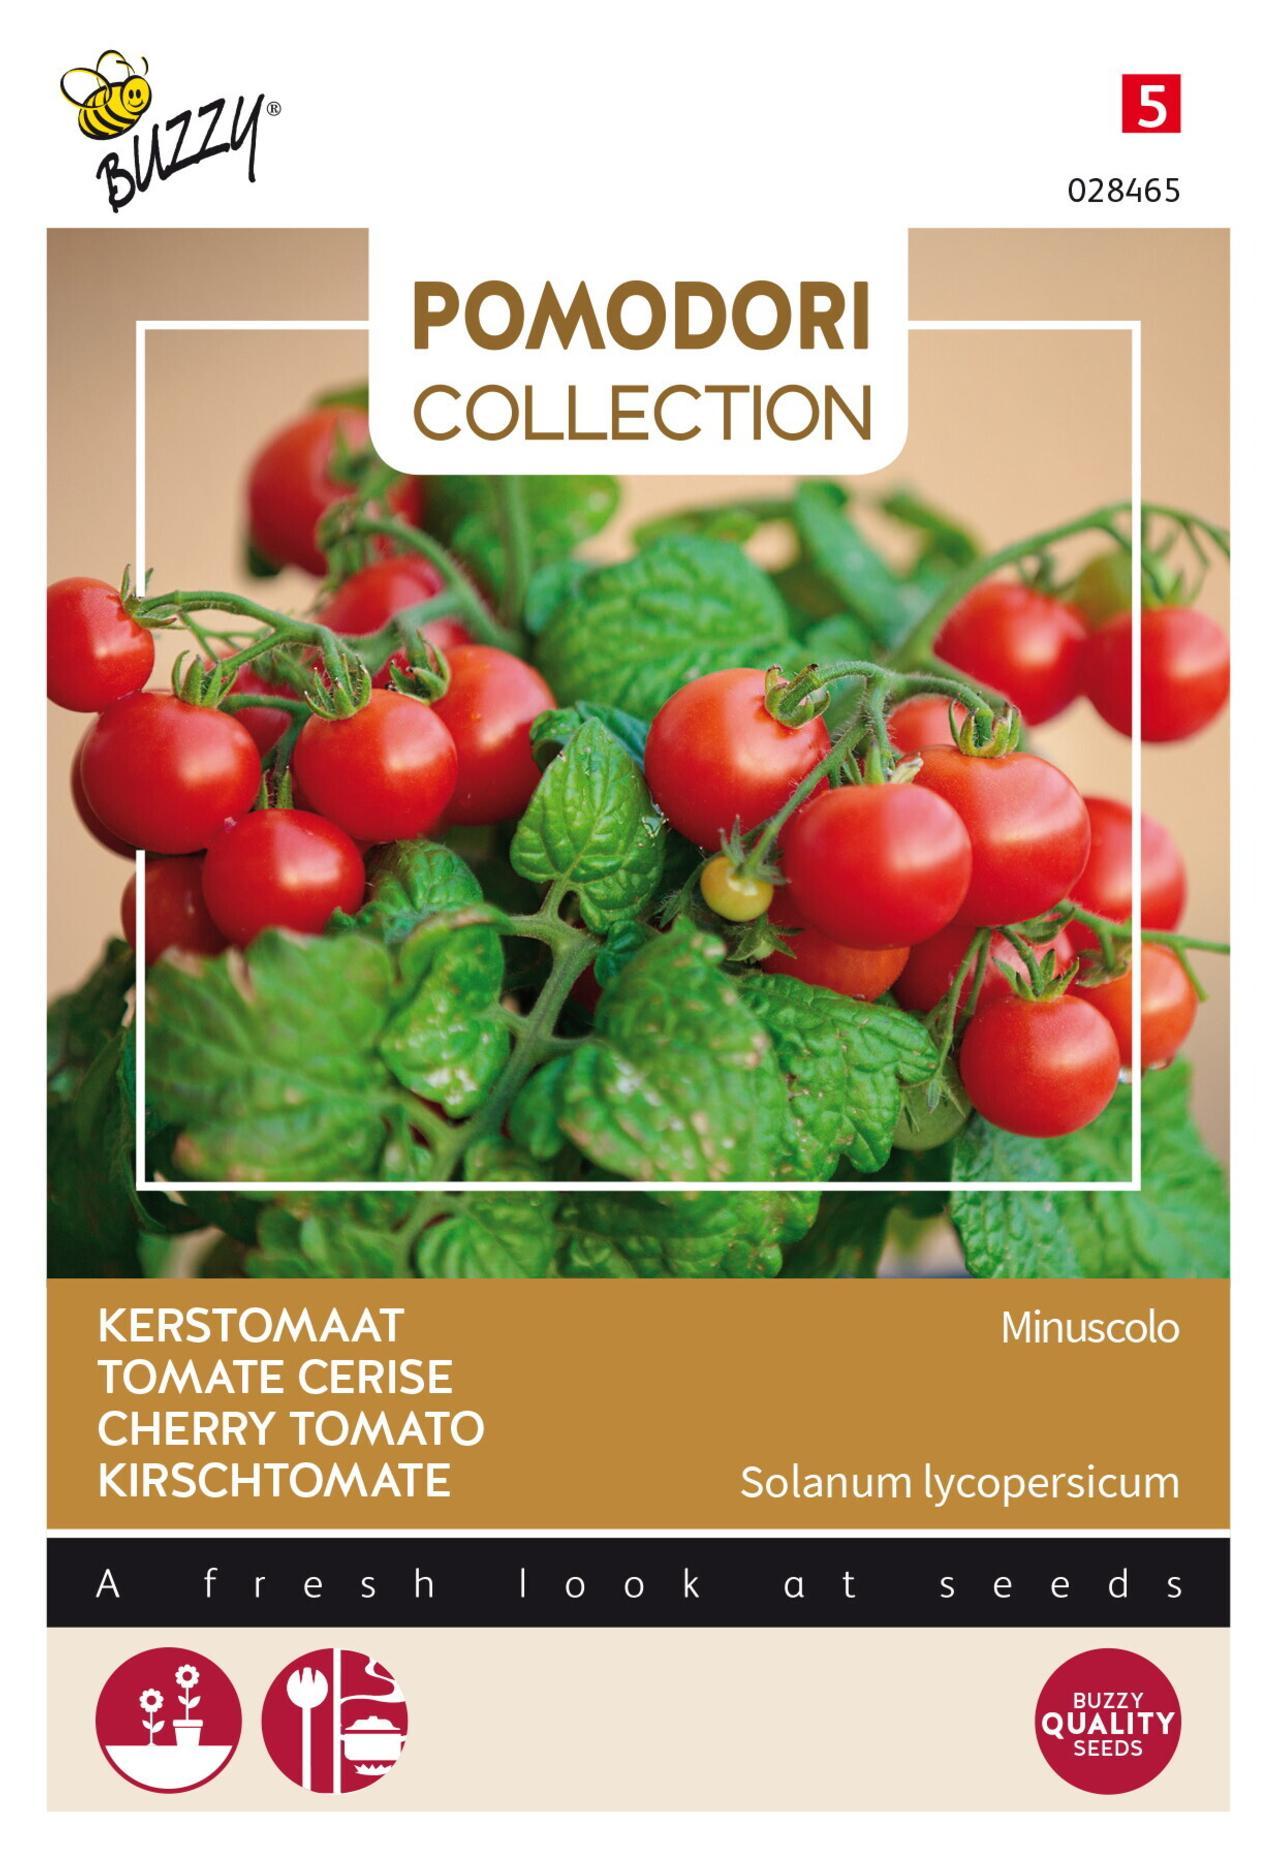 Solanum lycopersicum 'Minuscolo' plant